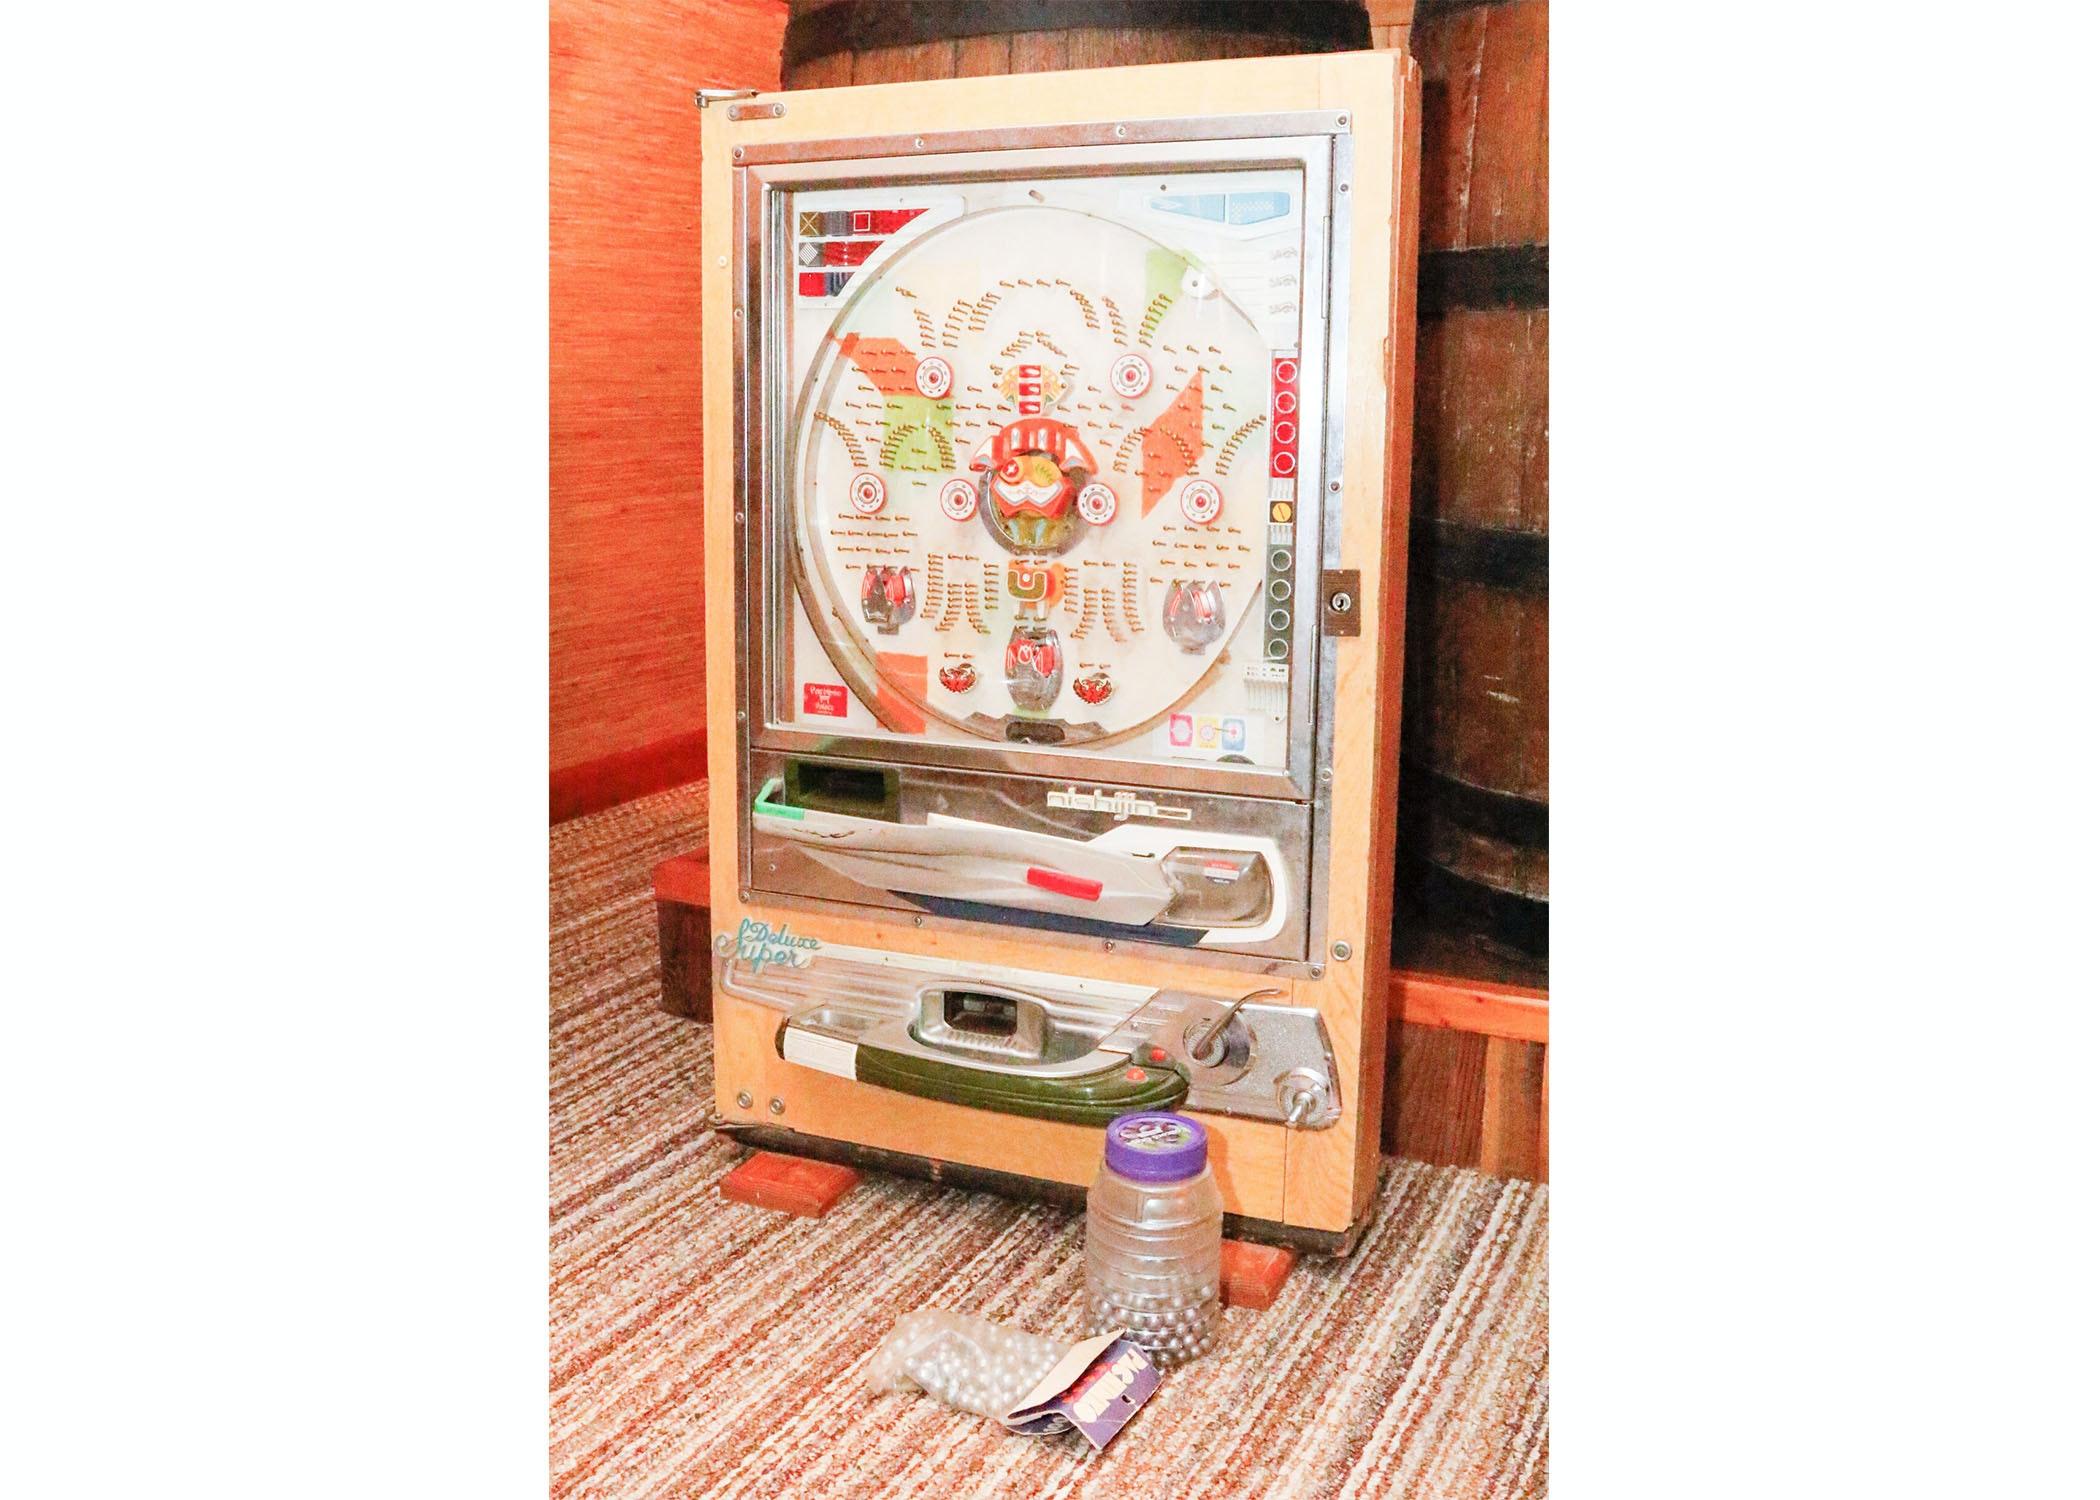 Blackjack casino gaming console 10